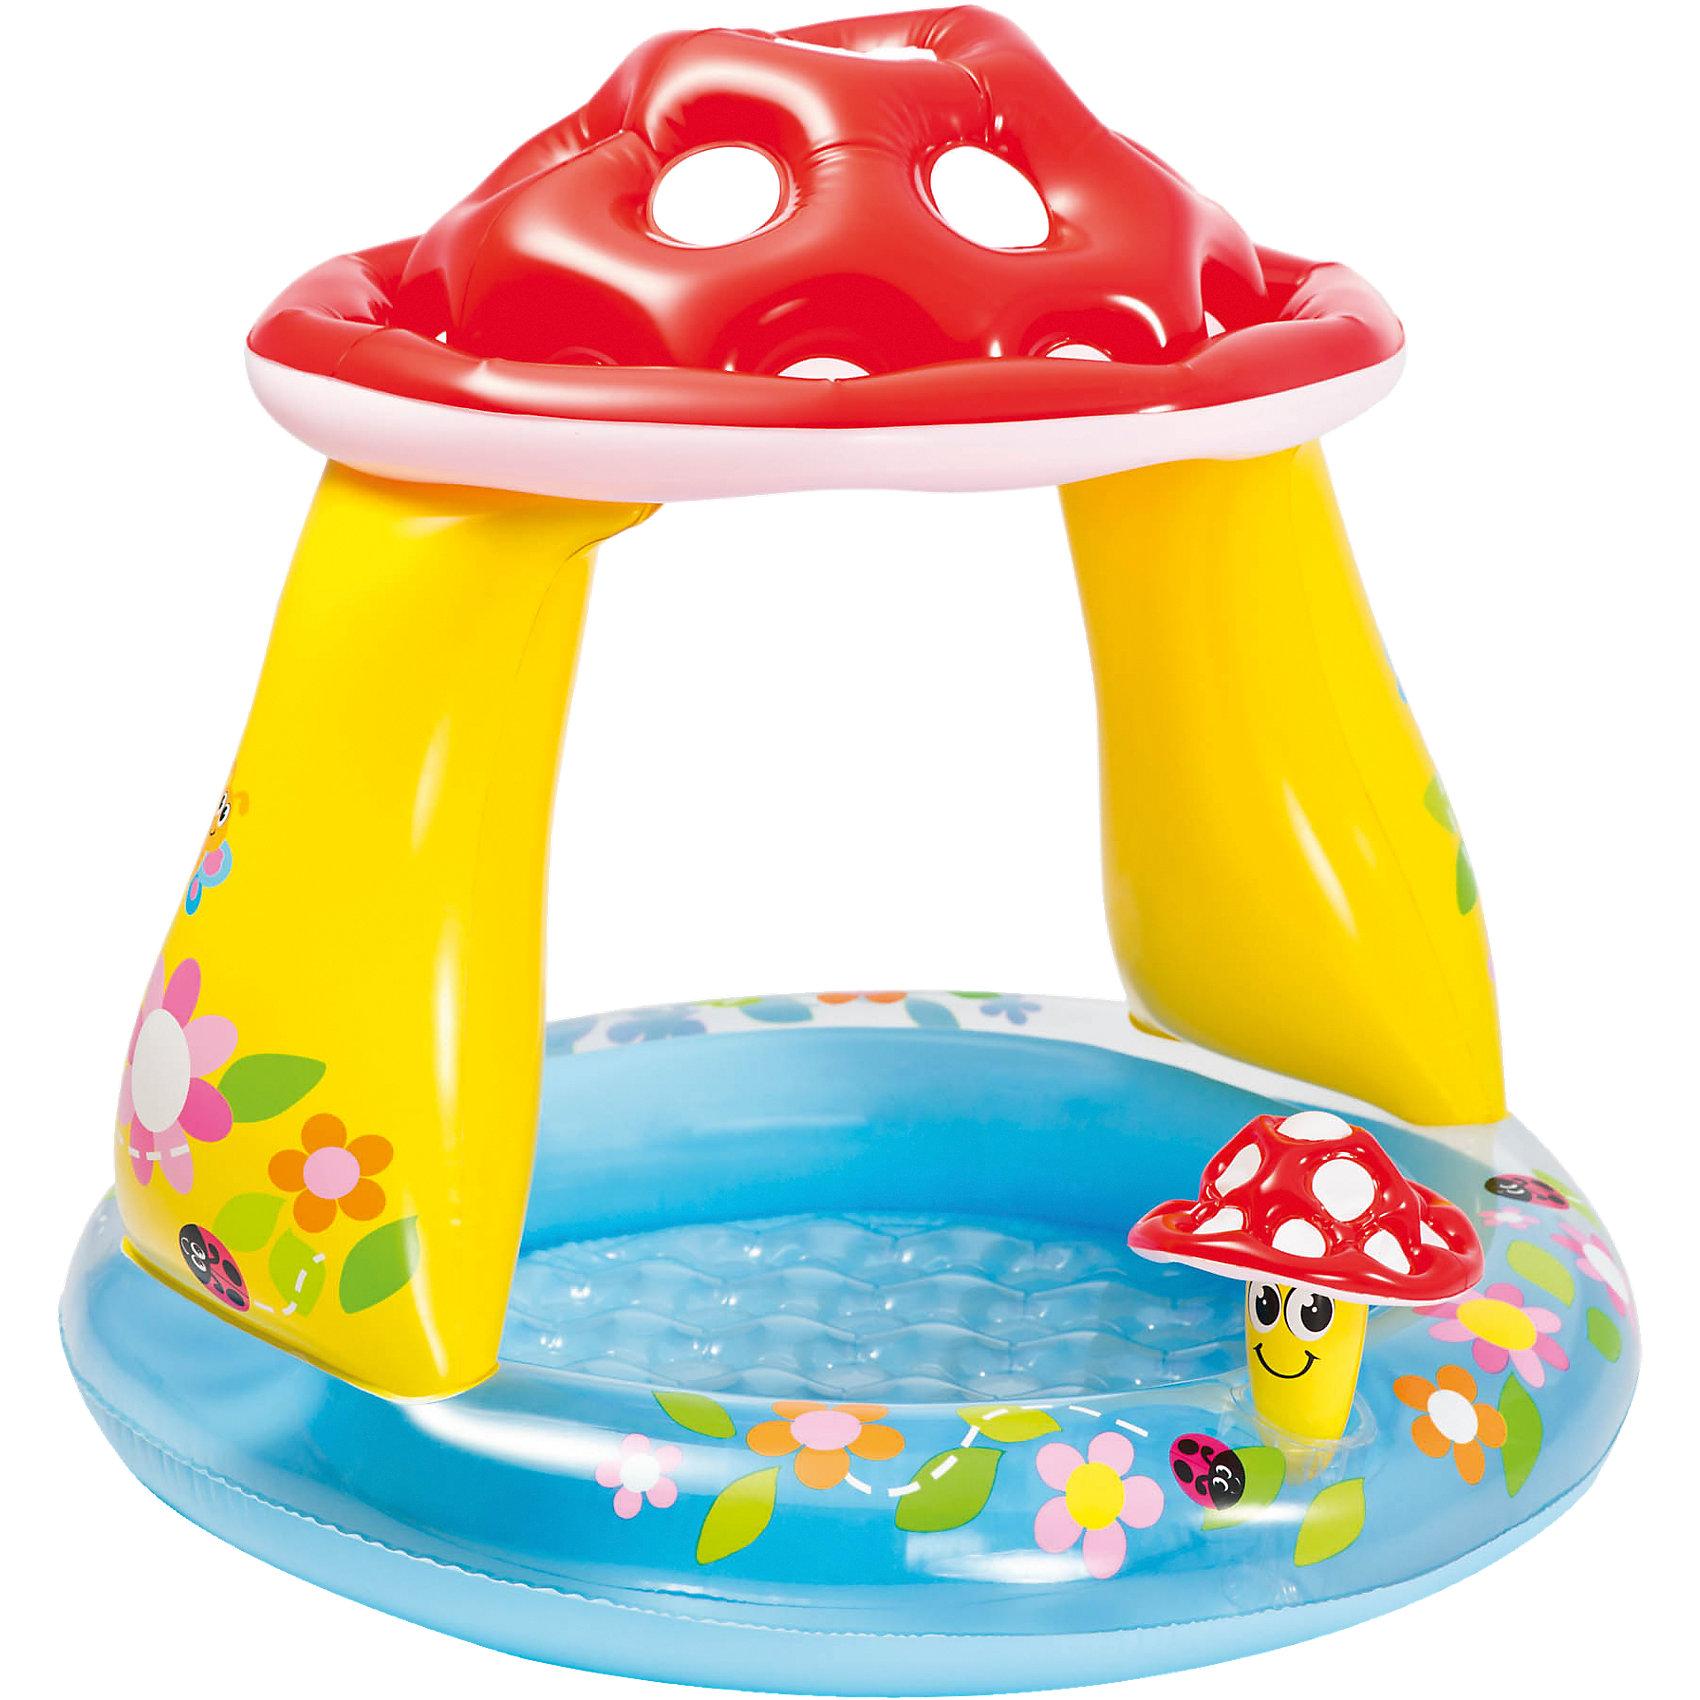 Intex Детский бассейн Мухомор, Intex